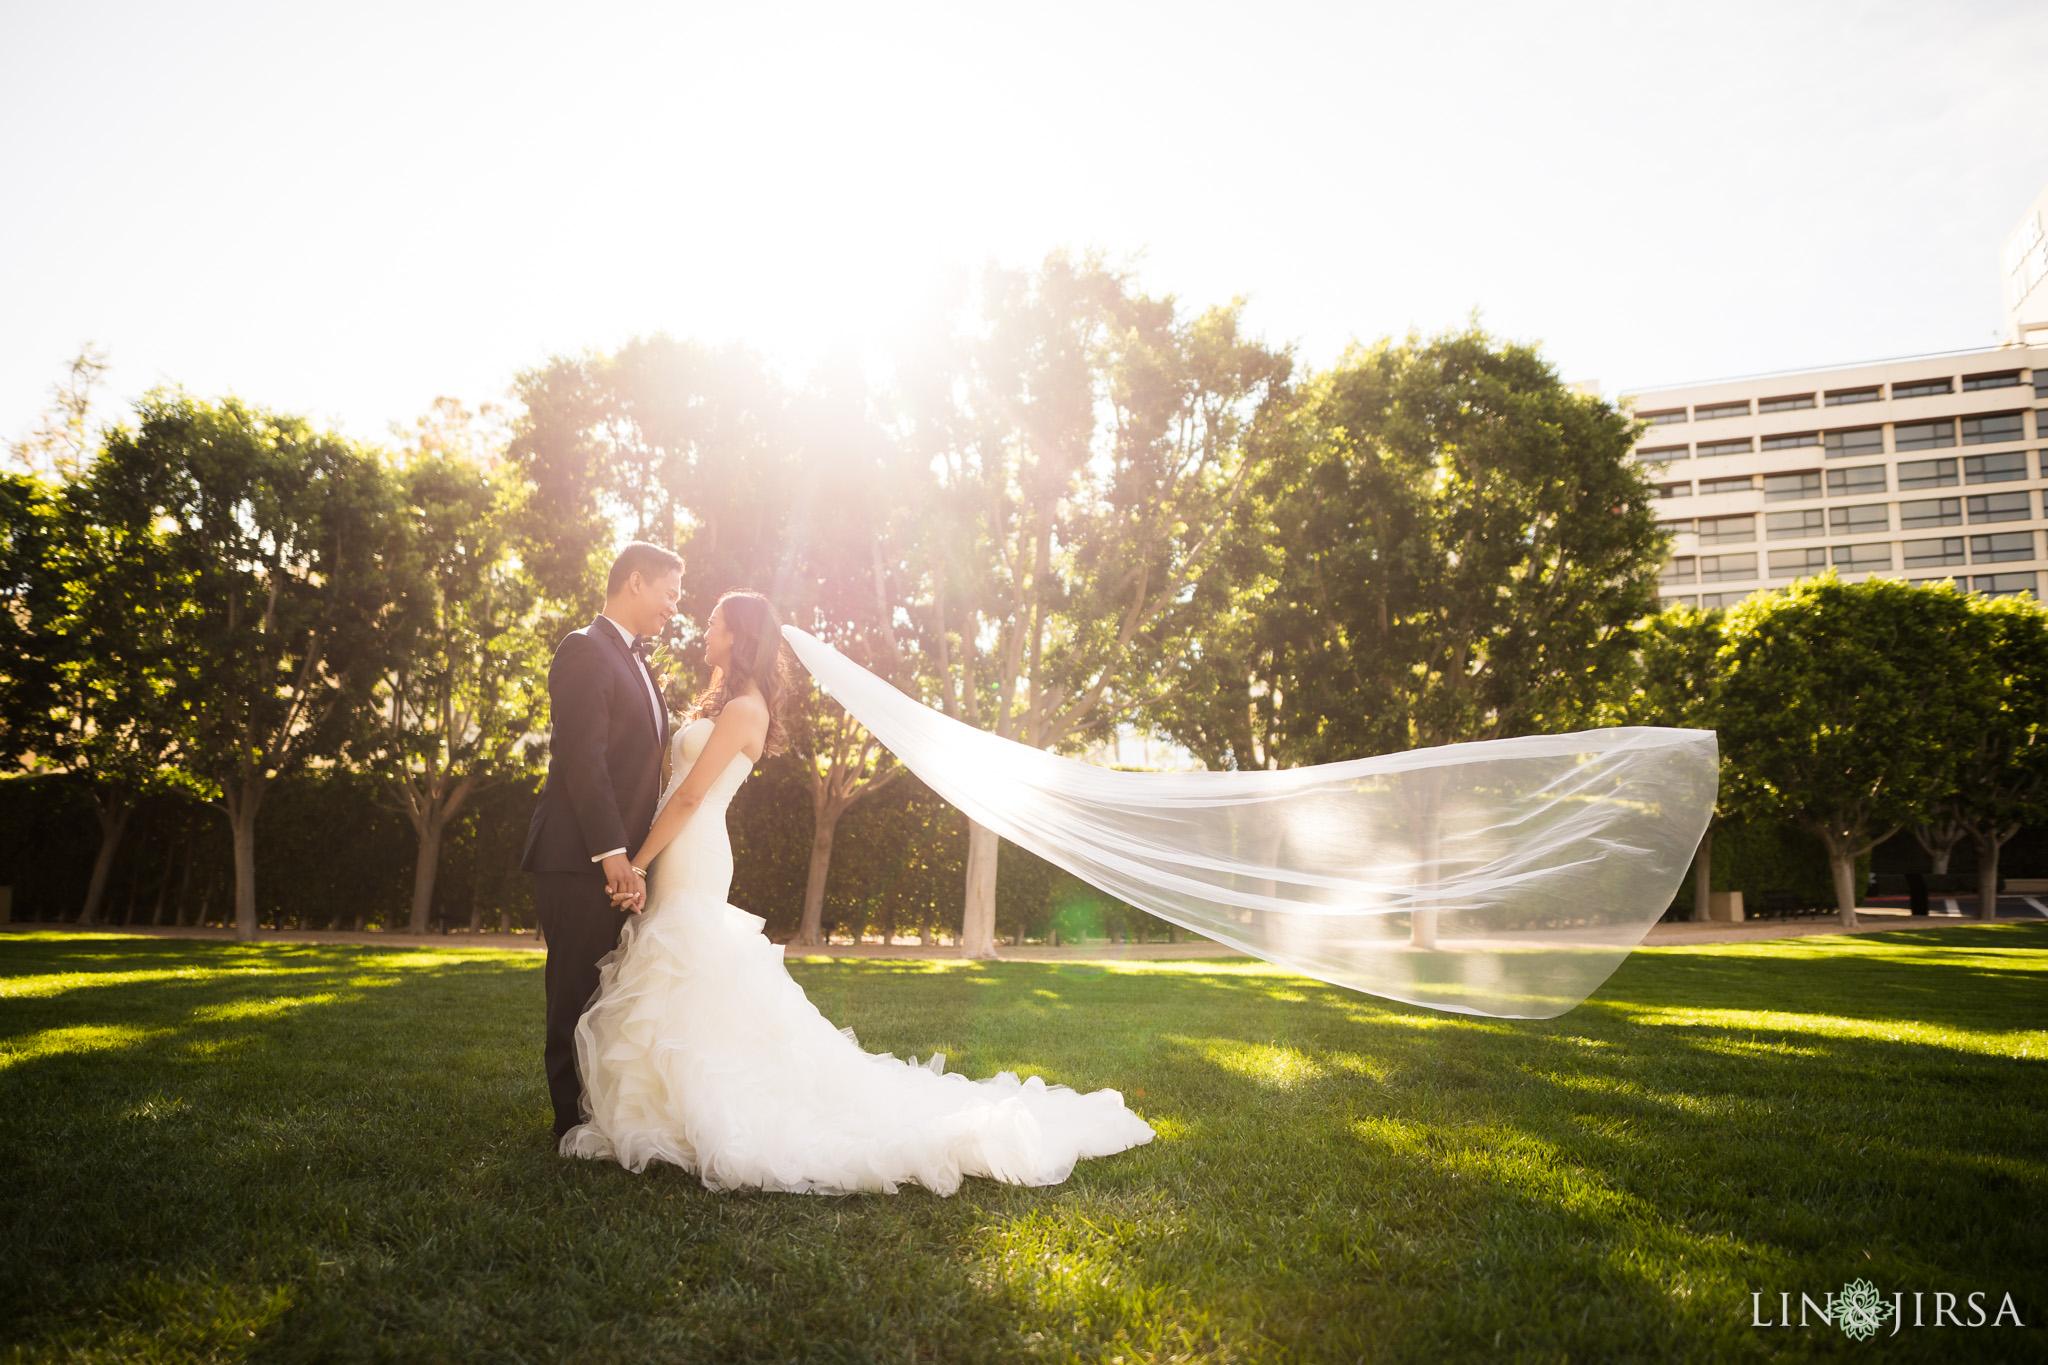 24 hotel irvine orange county wedding photography